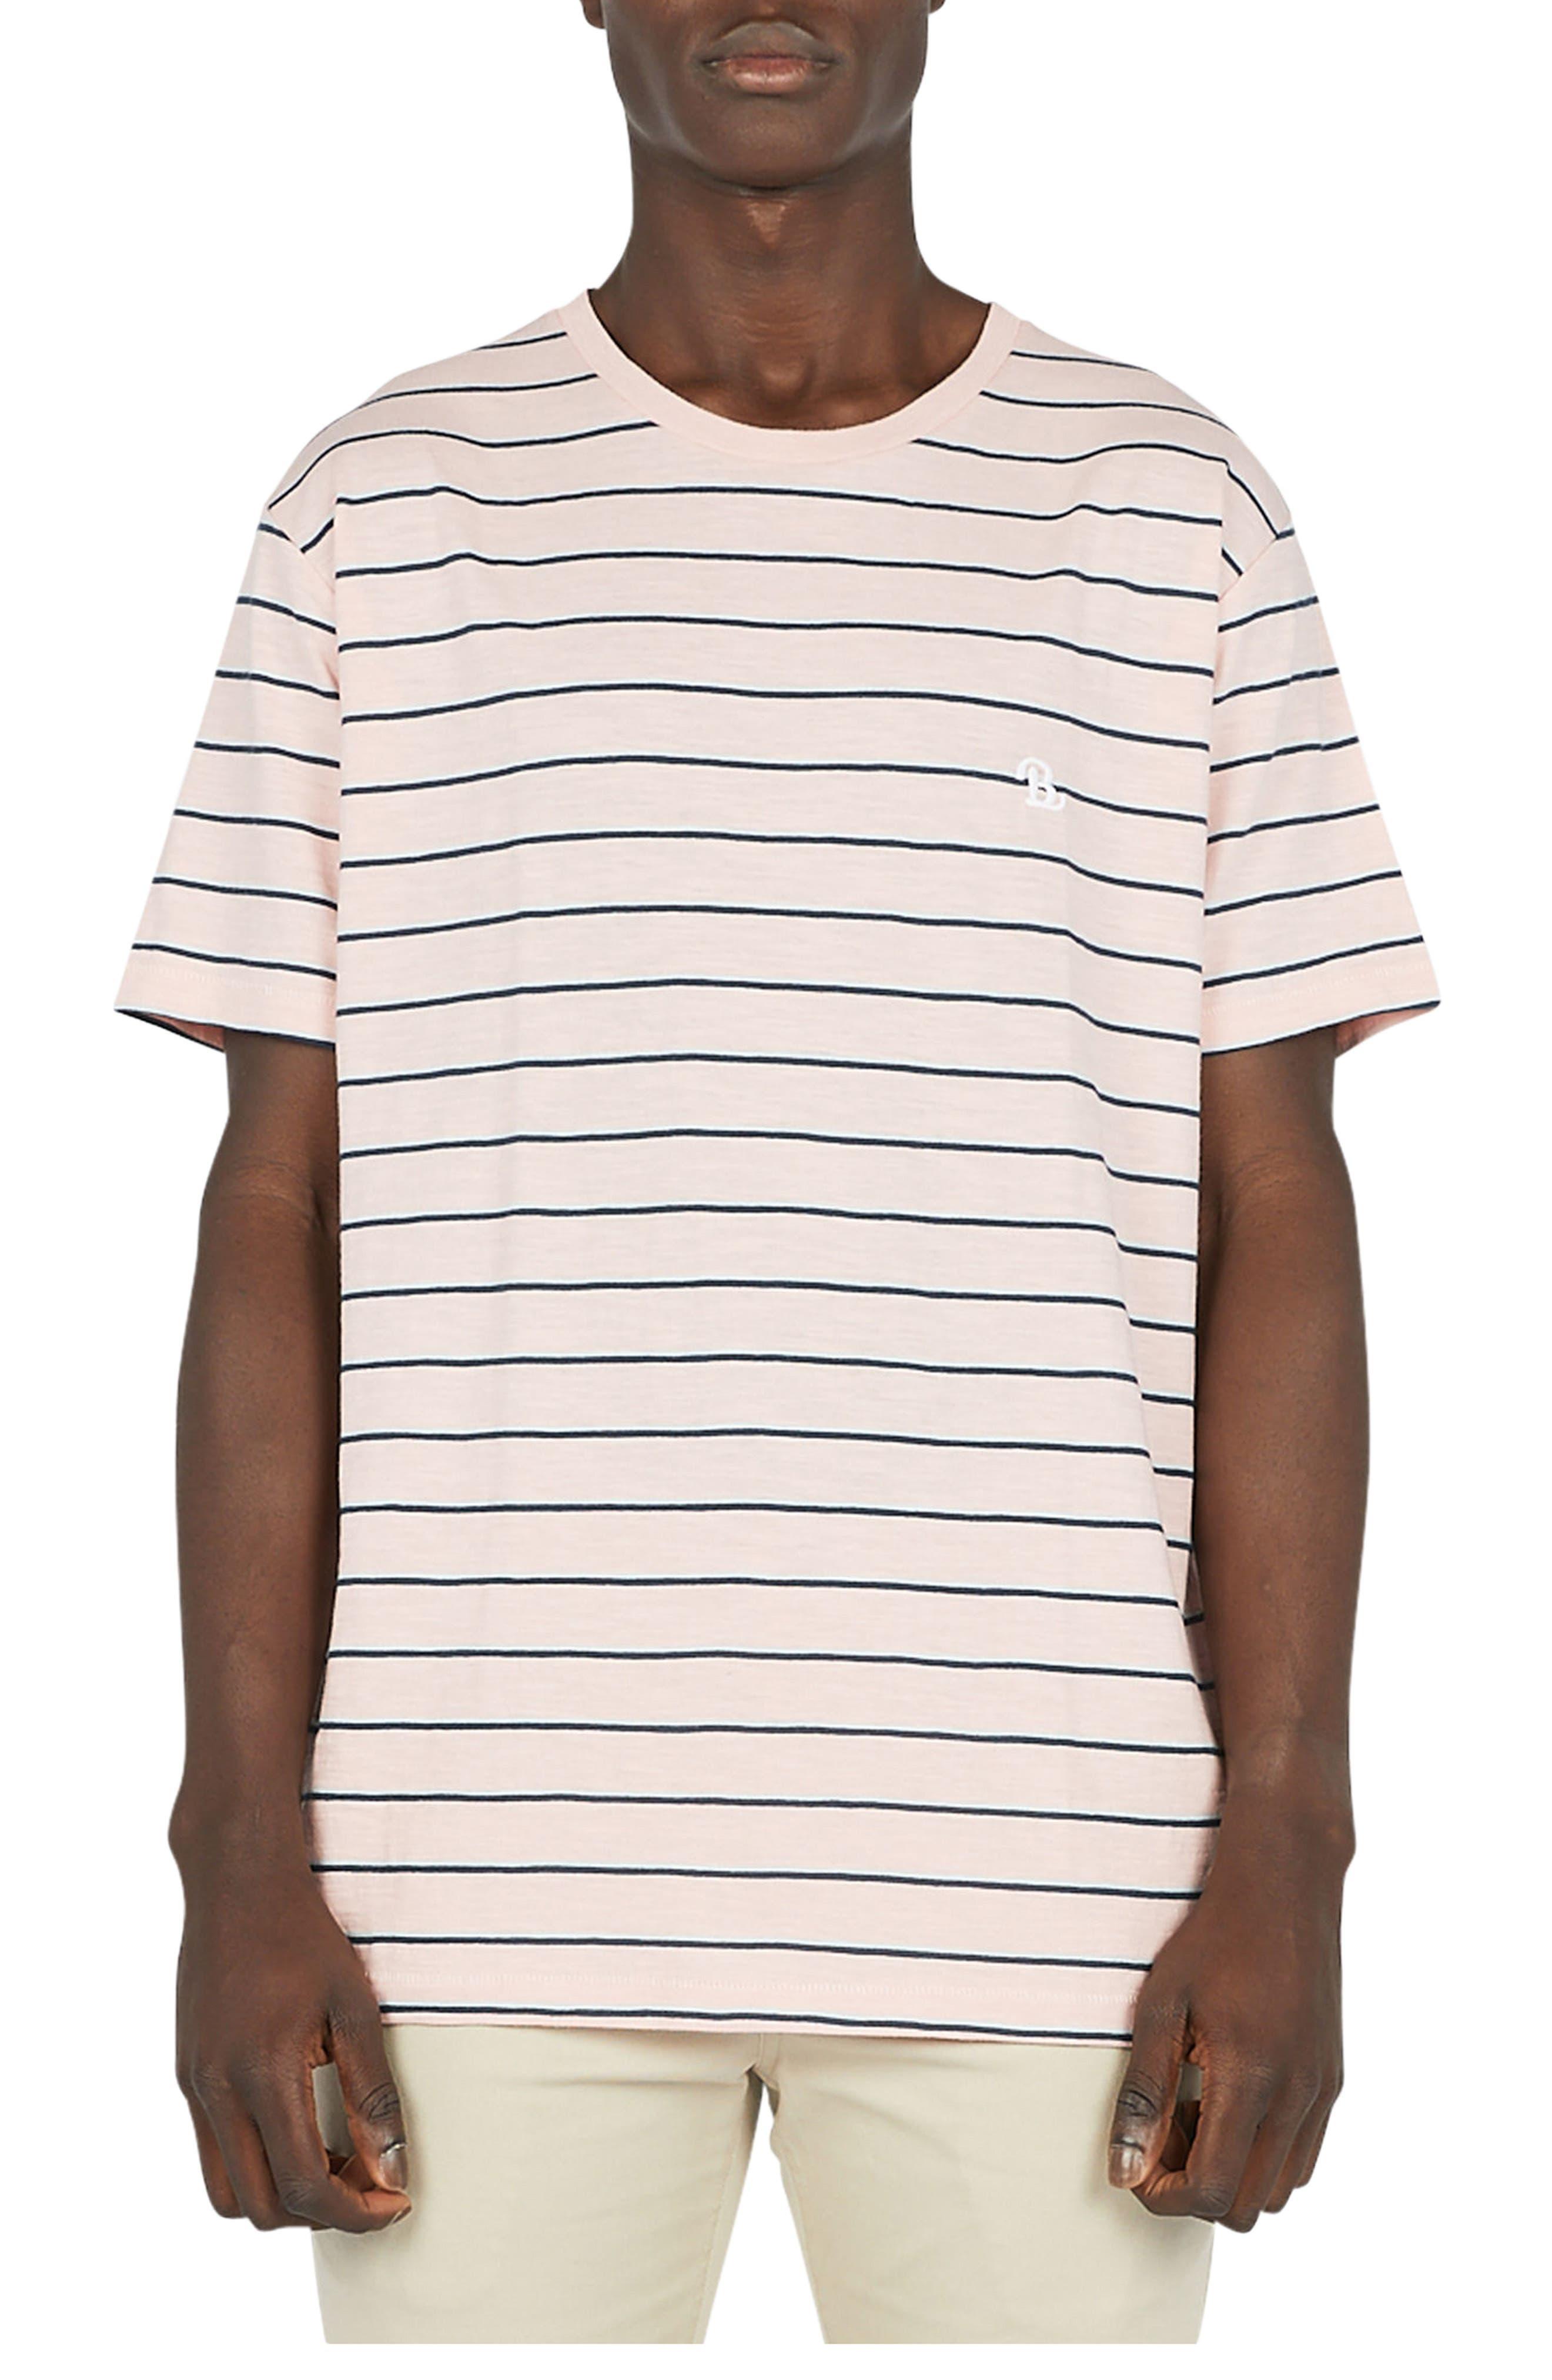 B.Schooled T-Shirt,                             Main thumbnail 1, color,                             682